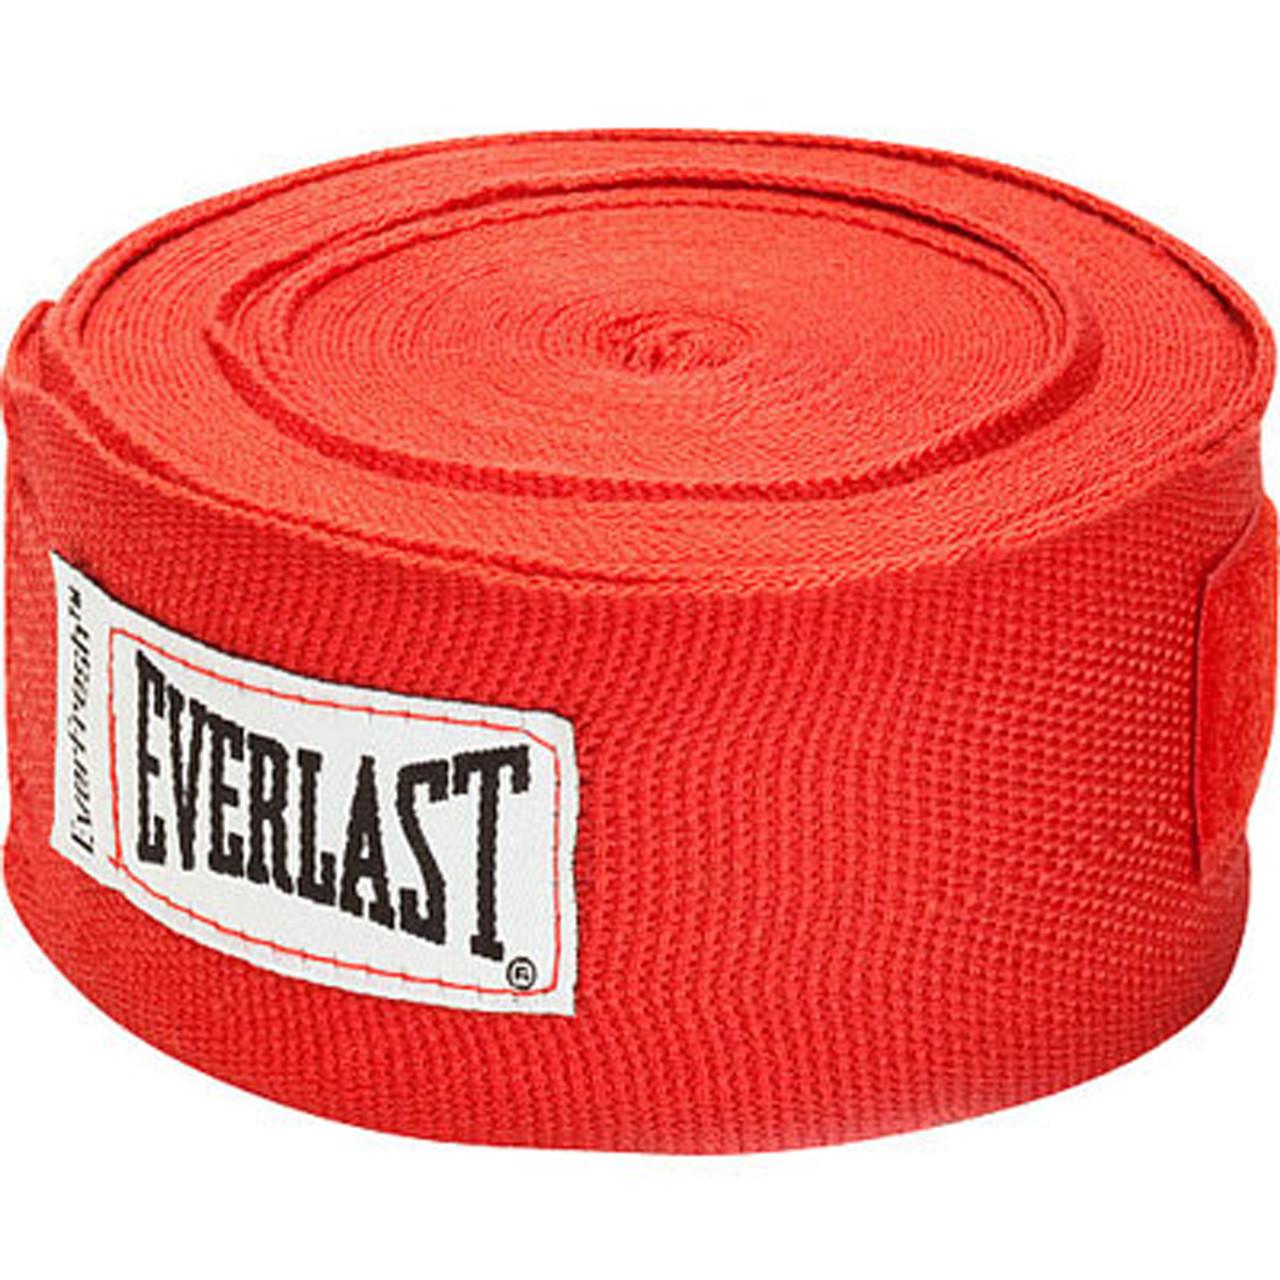 "Black Everlast Boxing 180/"" Mexican Handwraps"